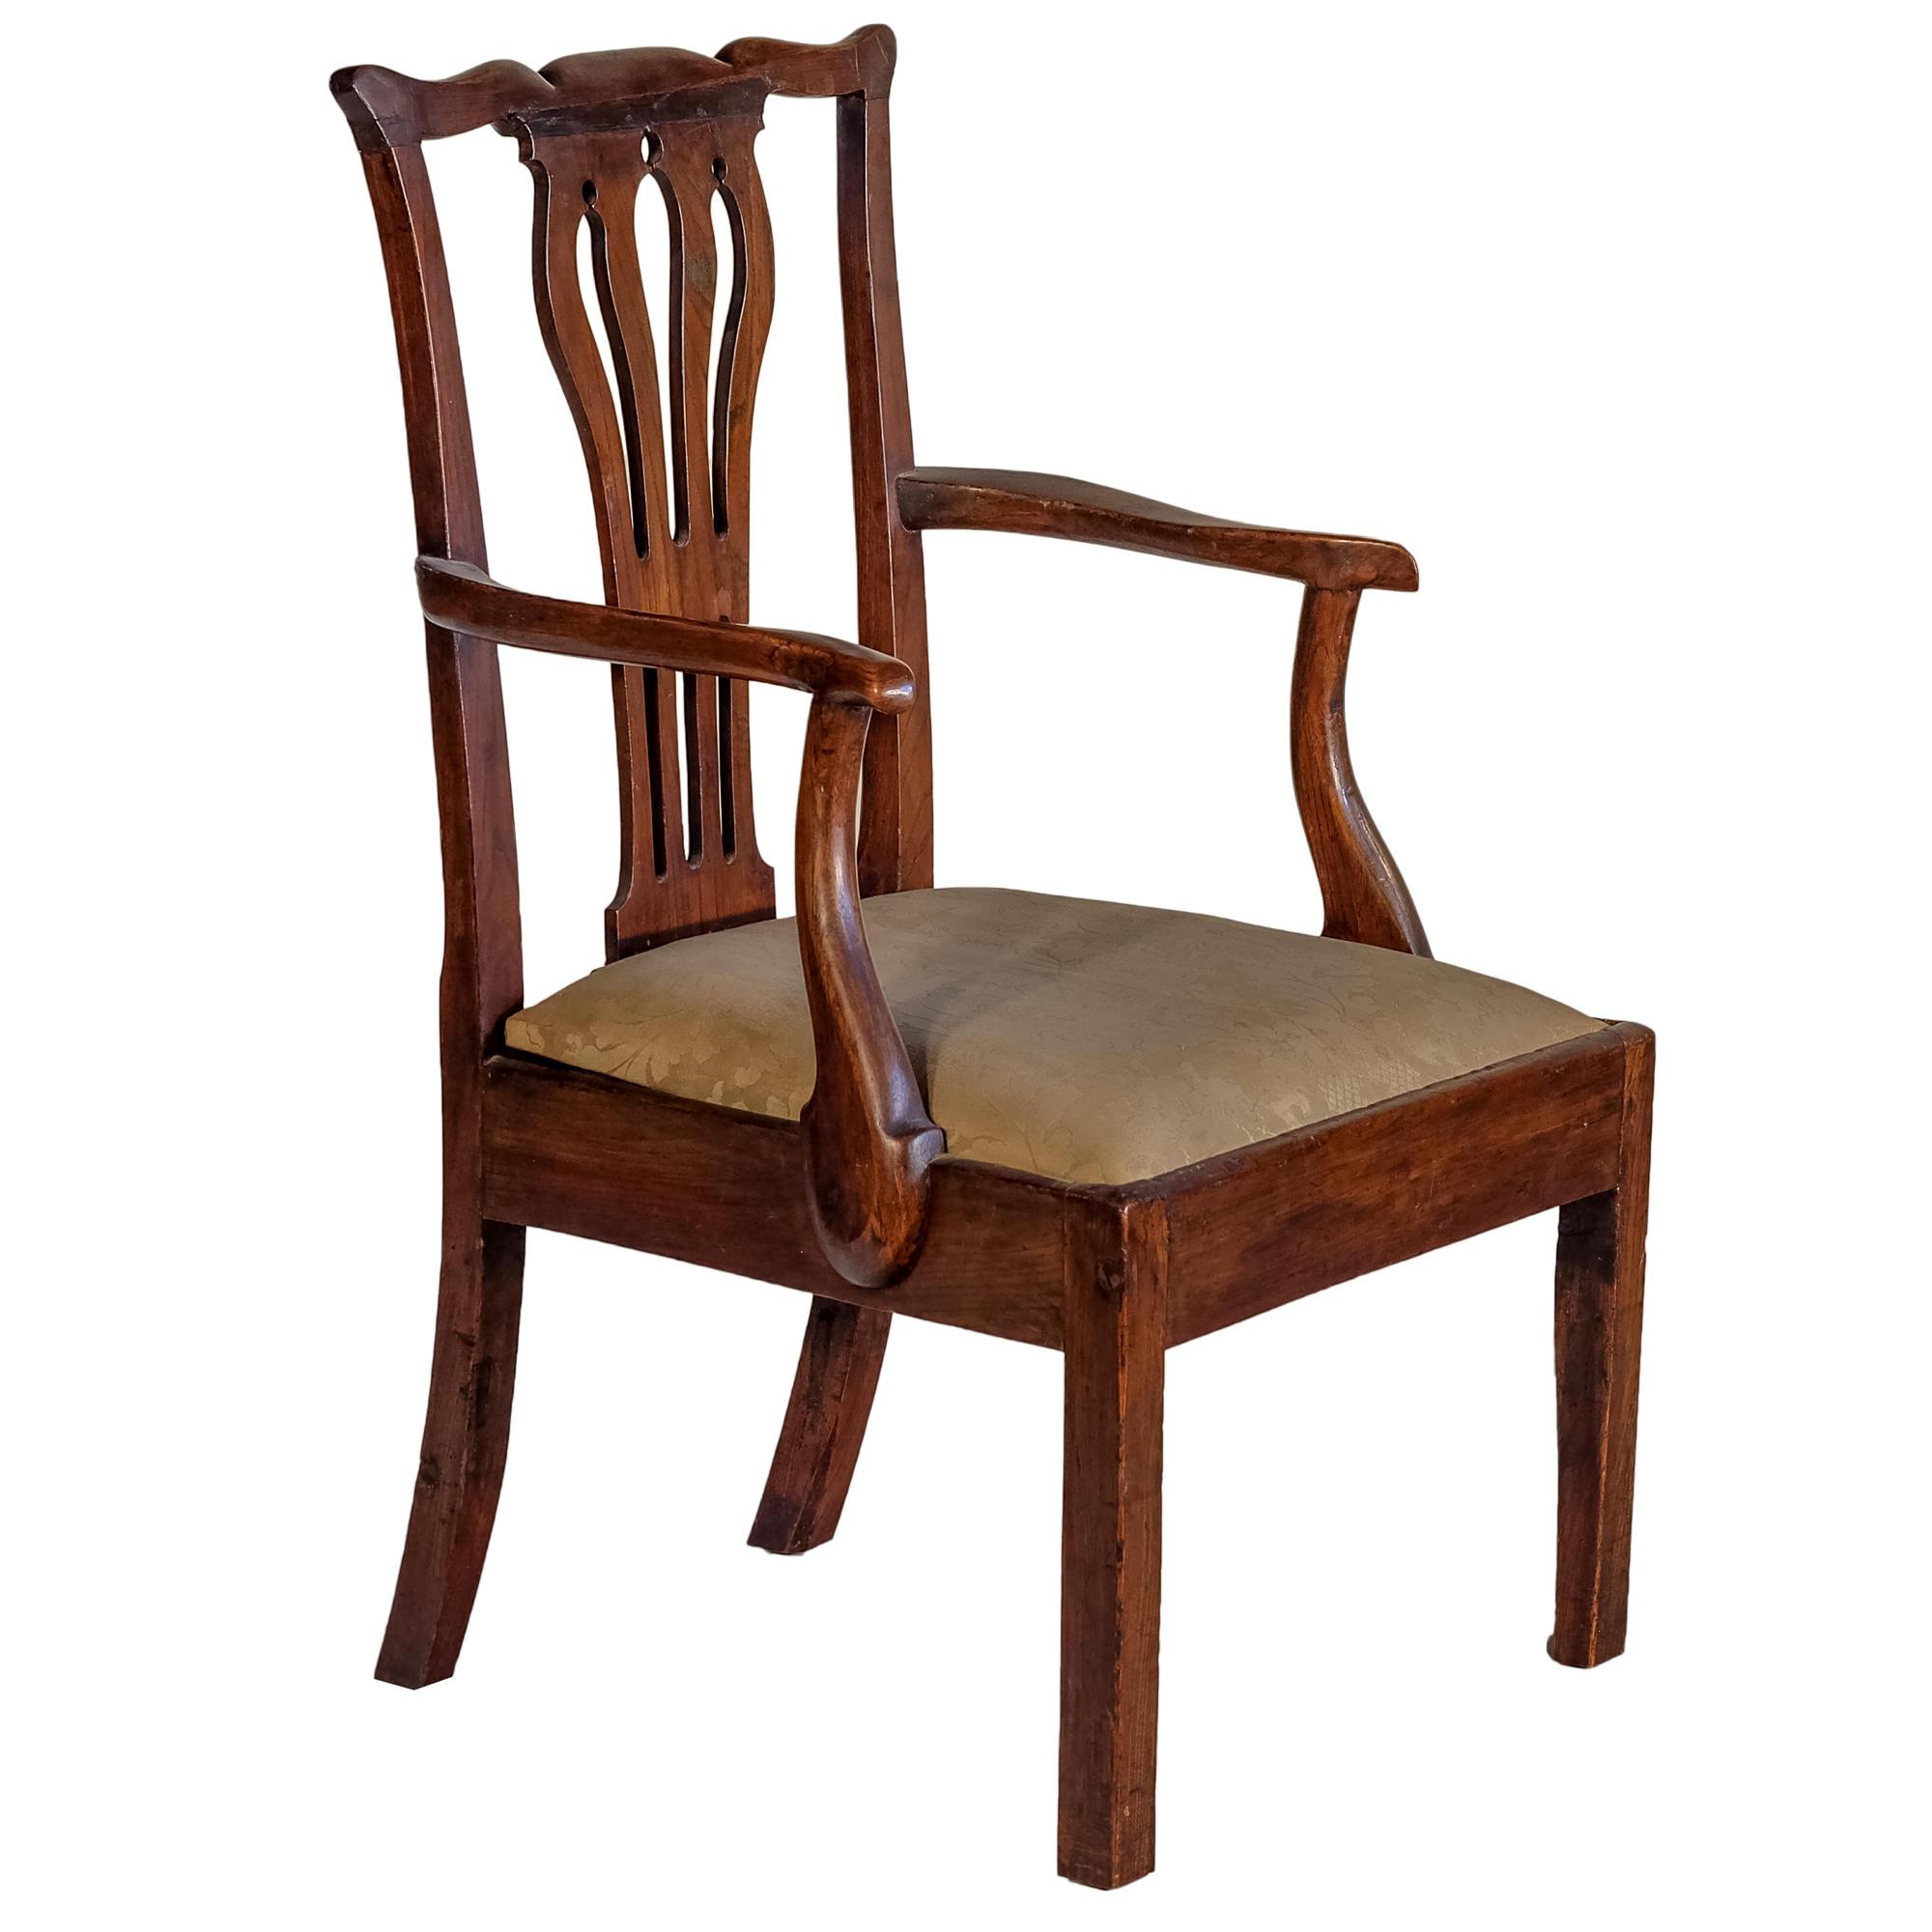 'George III Elm Elbow Chair Circa 1800'